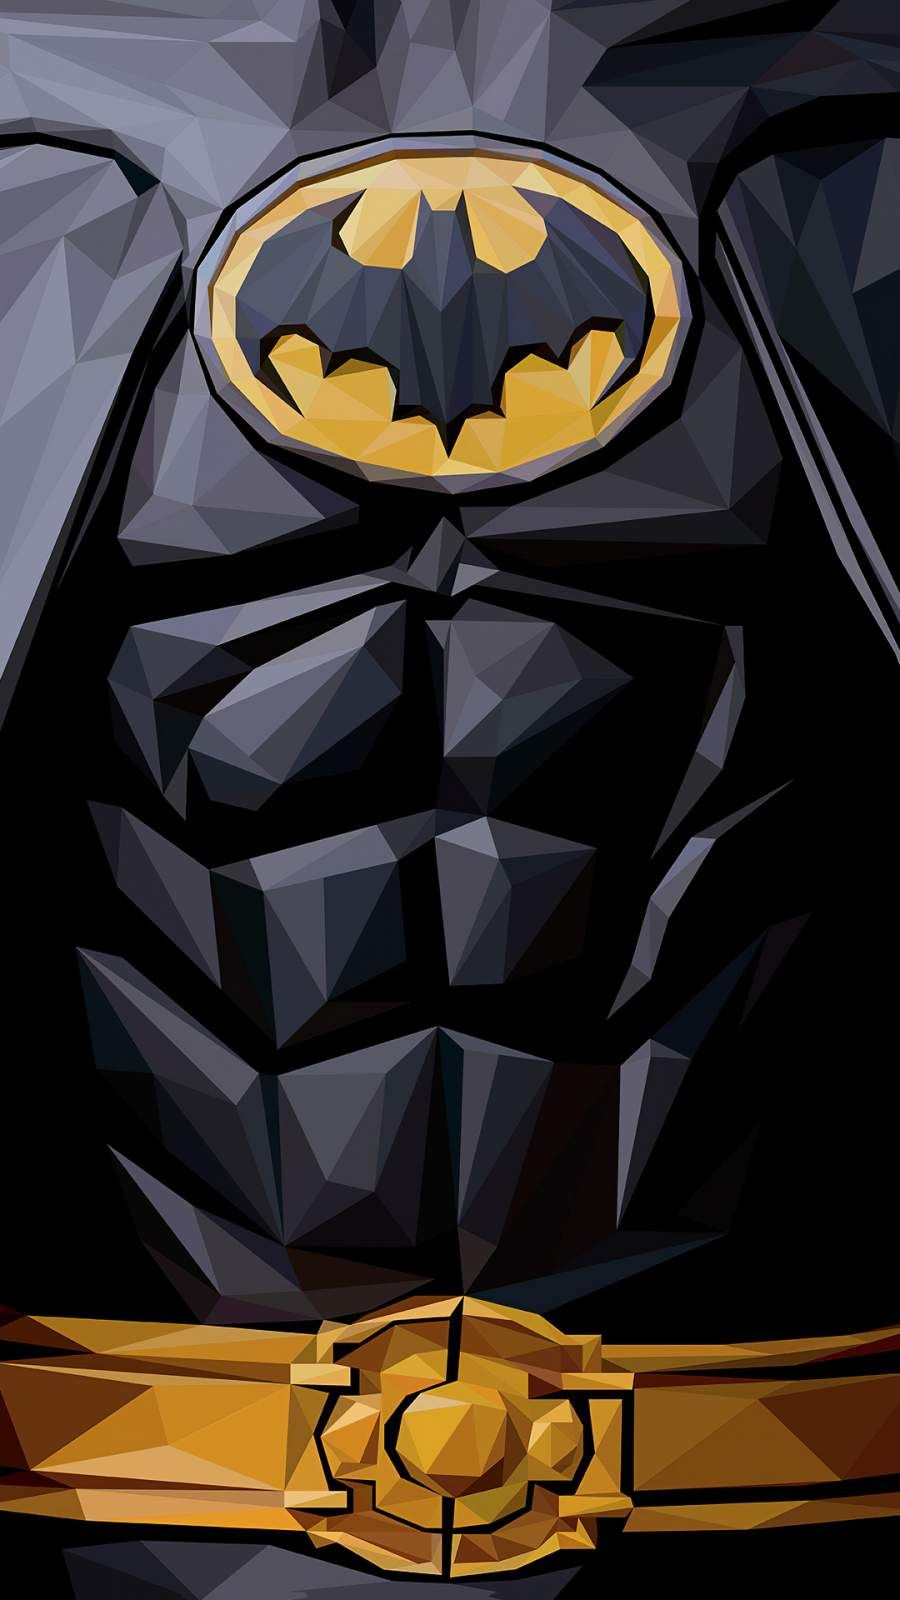 Batman Polygon 4k Iphone Wallpaper In 2020 Batman Wallpaper